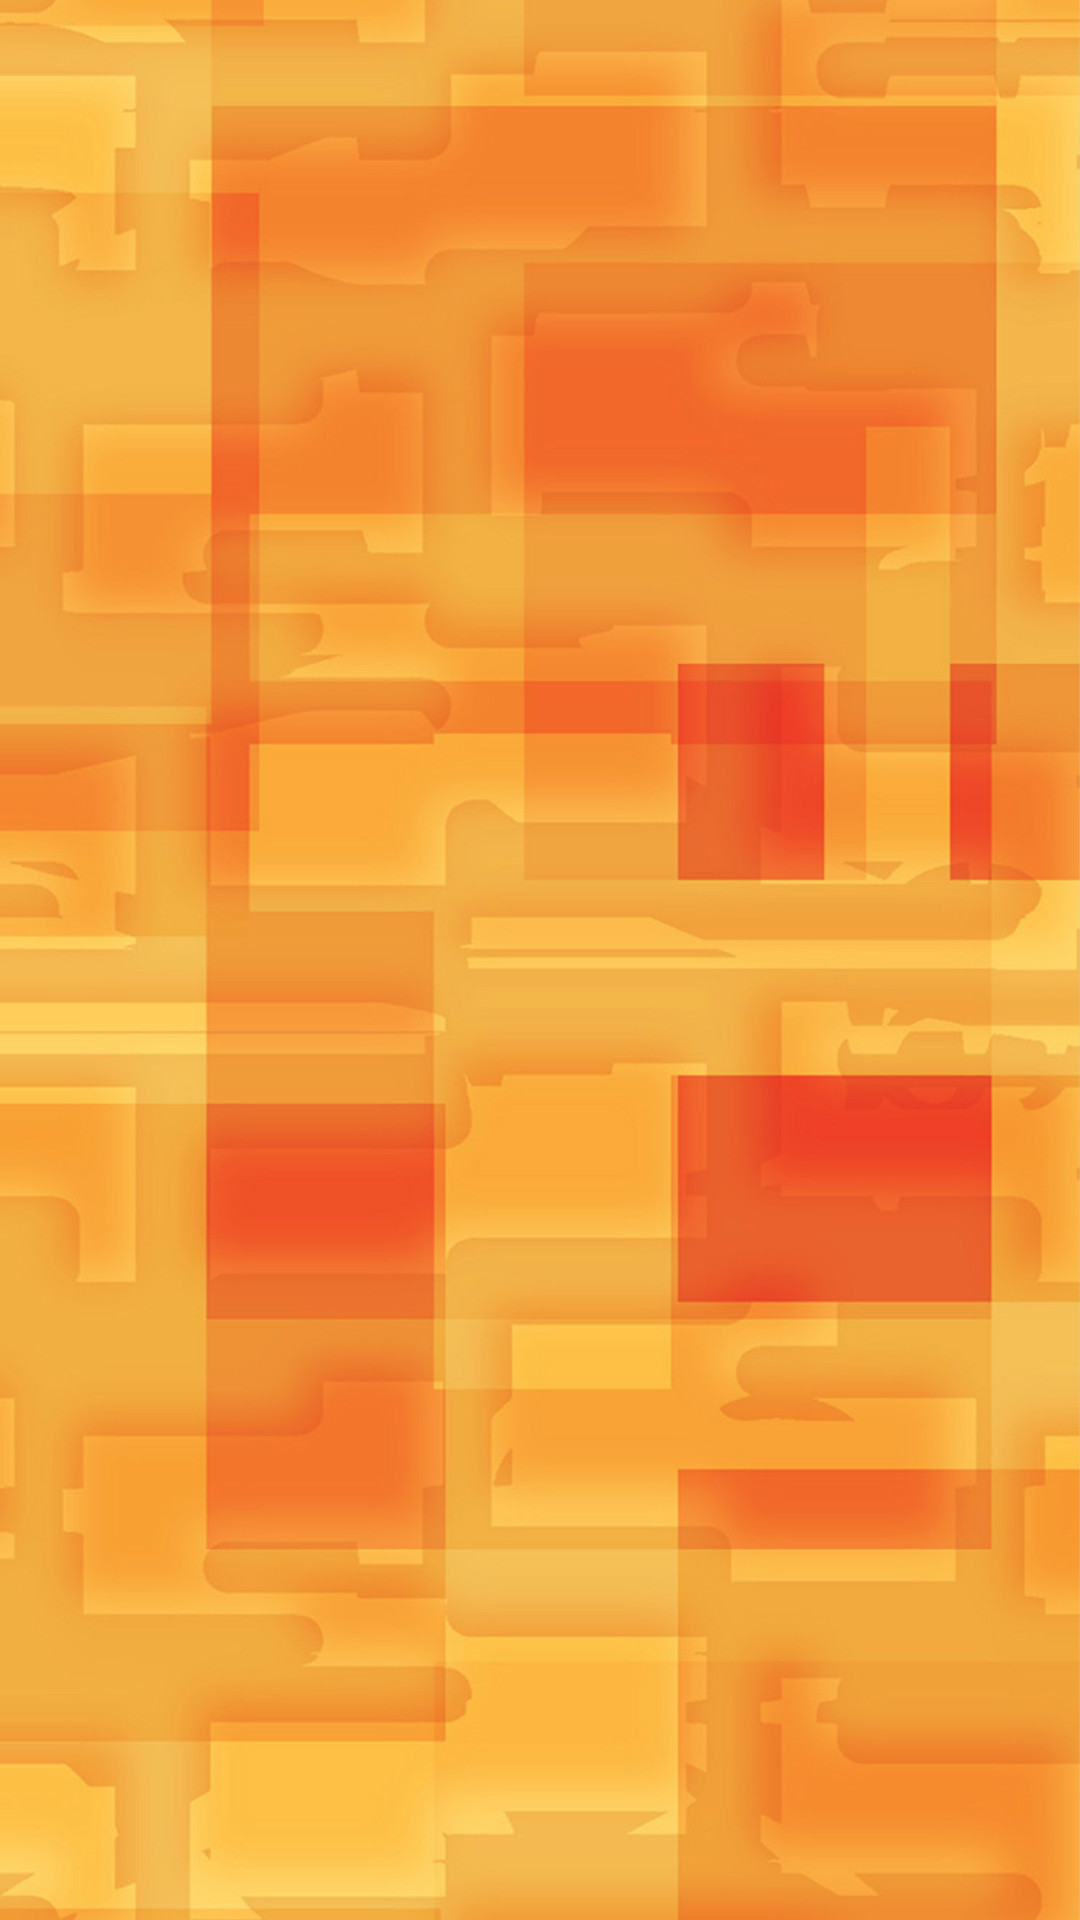 Square World Pattern Orange Yellow #iPhone #6 #plus #wallpaper